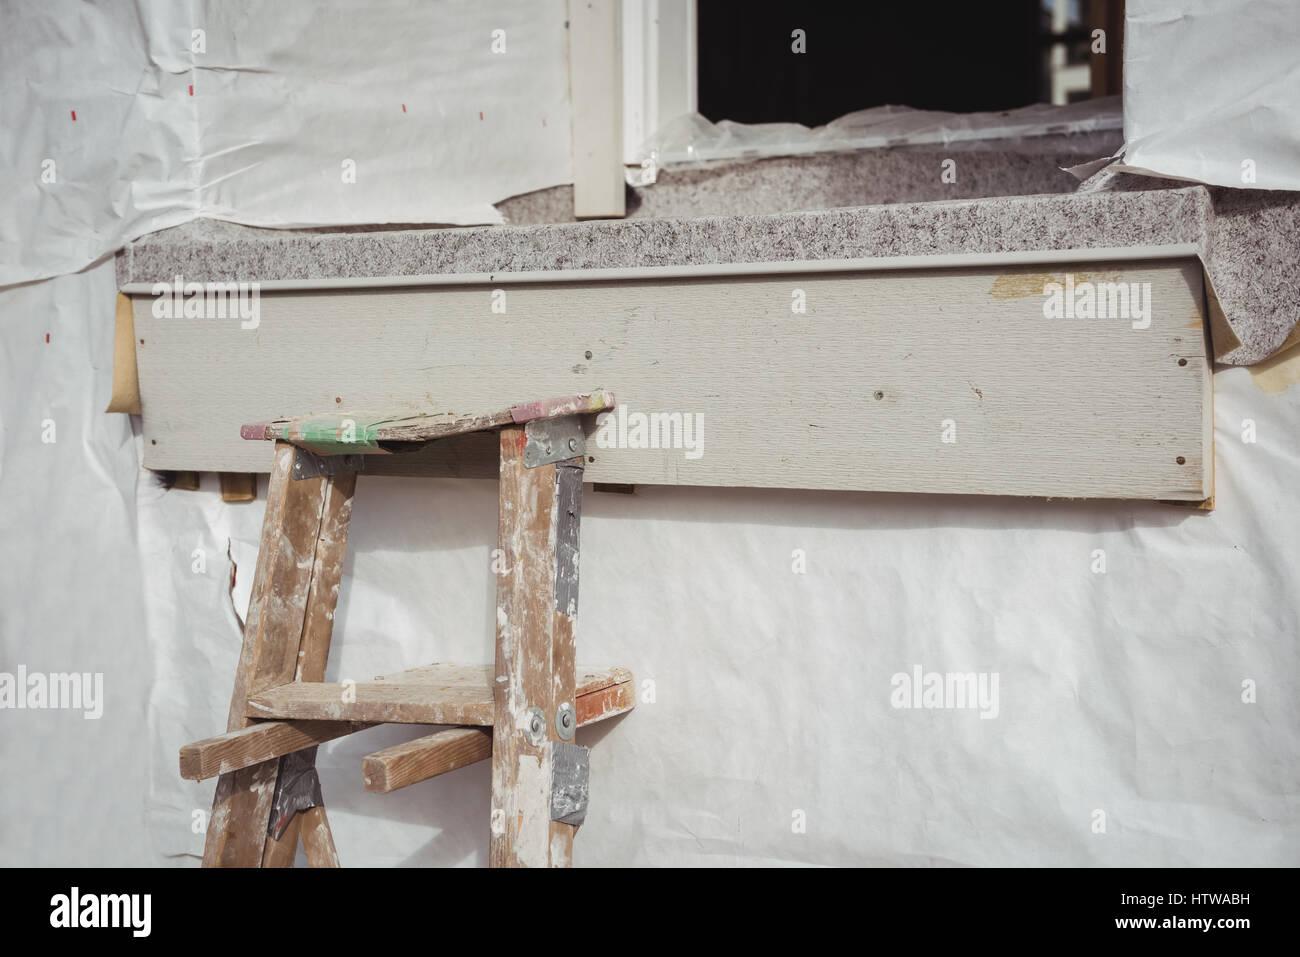 Stepladder against building under renovation Stock Photo